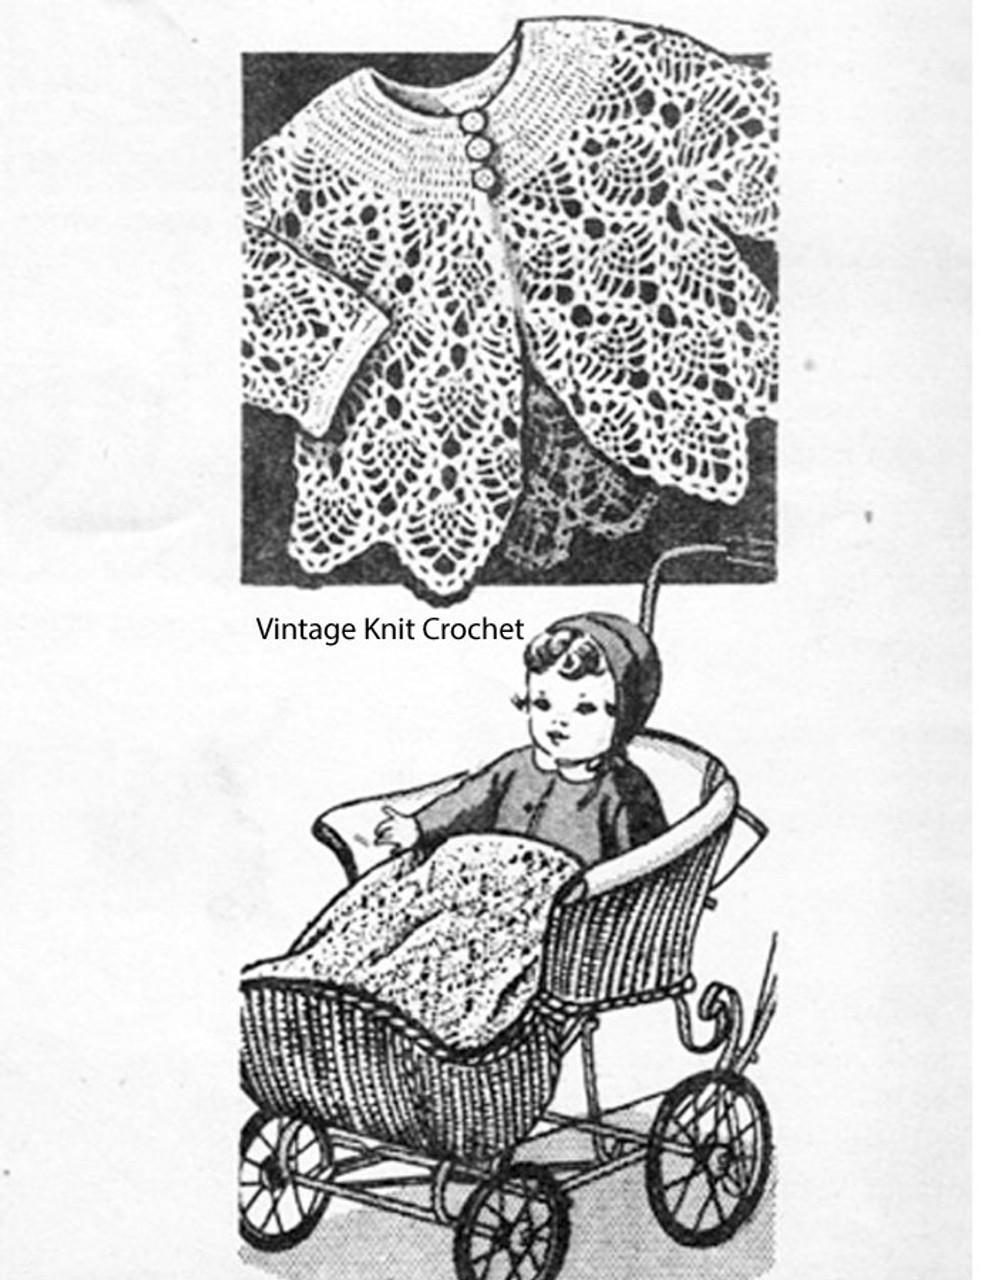 Vintage Baby Jacket Crochet Pattern, Pineapple Stitch Design 3185